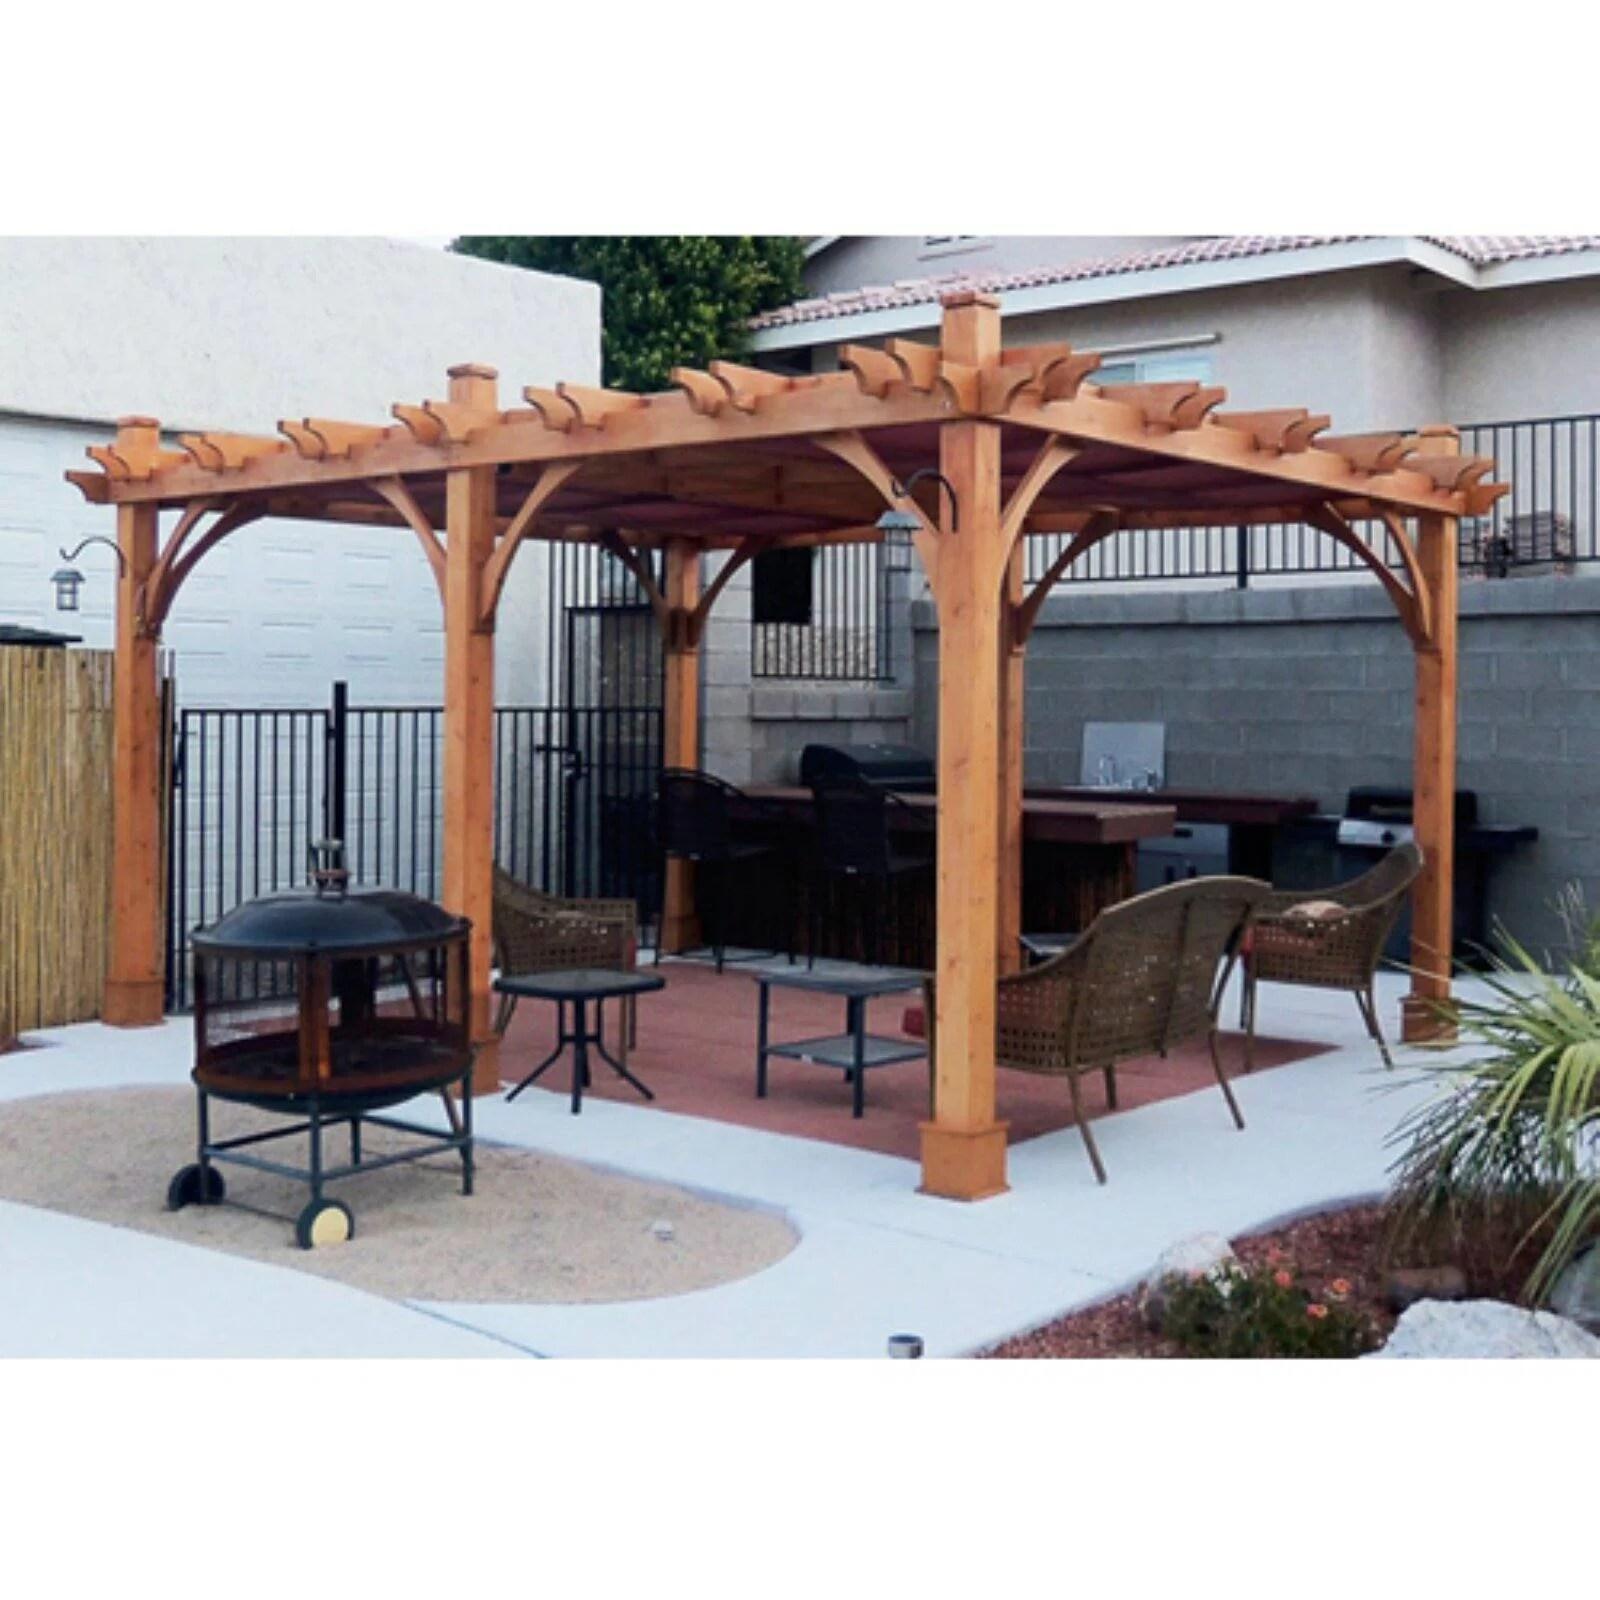 Outdoor Living Today Breeze 12 x 16 ft. Pergola - Walmart ... on Walmart Outdoor Living  id=61592